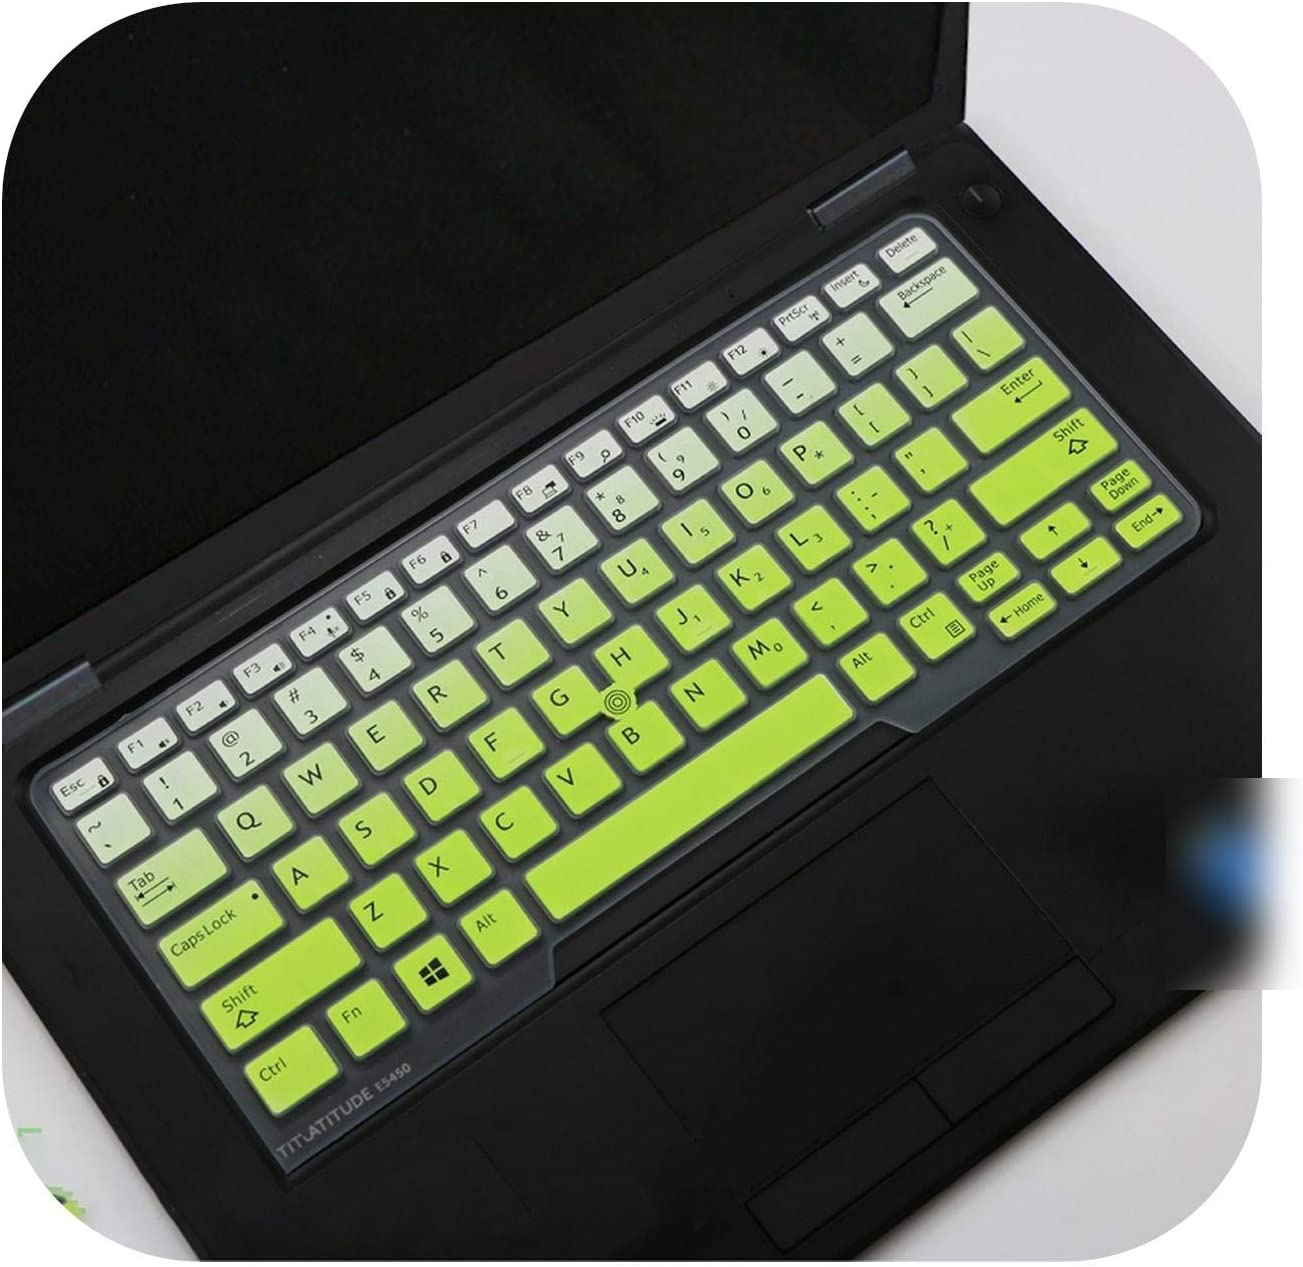 Silicone Laptop Keyboard Cover Skin for Dell Latitude E5250 E 5270 E 7250 E 7270 E5280 E7275 E 7280 E7370 Xps 12 9250 12.5-White